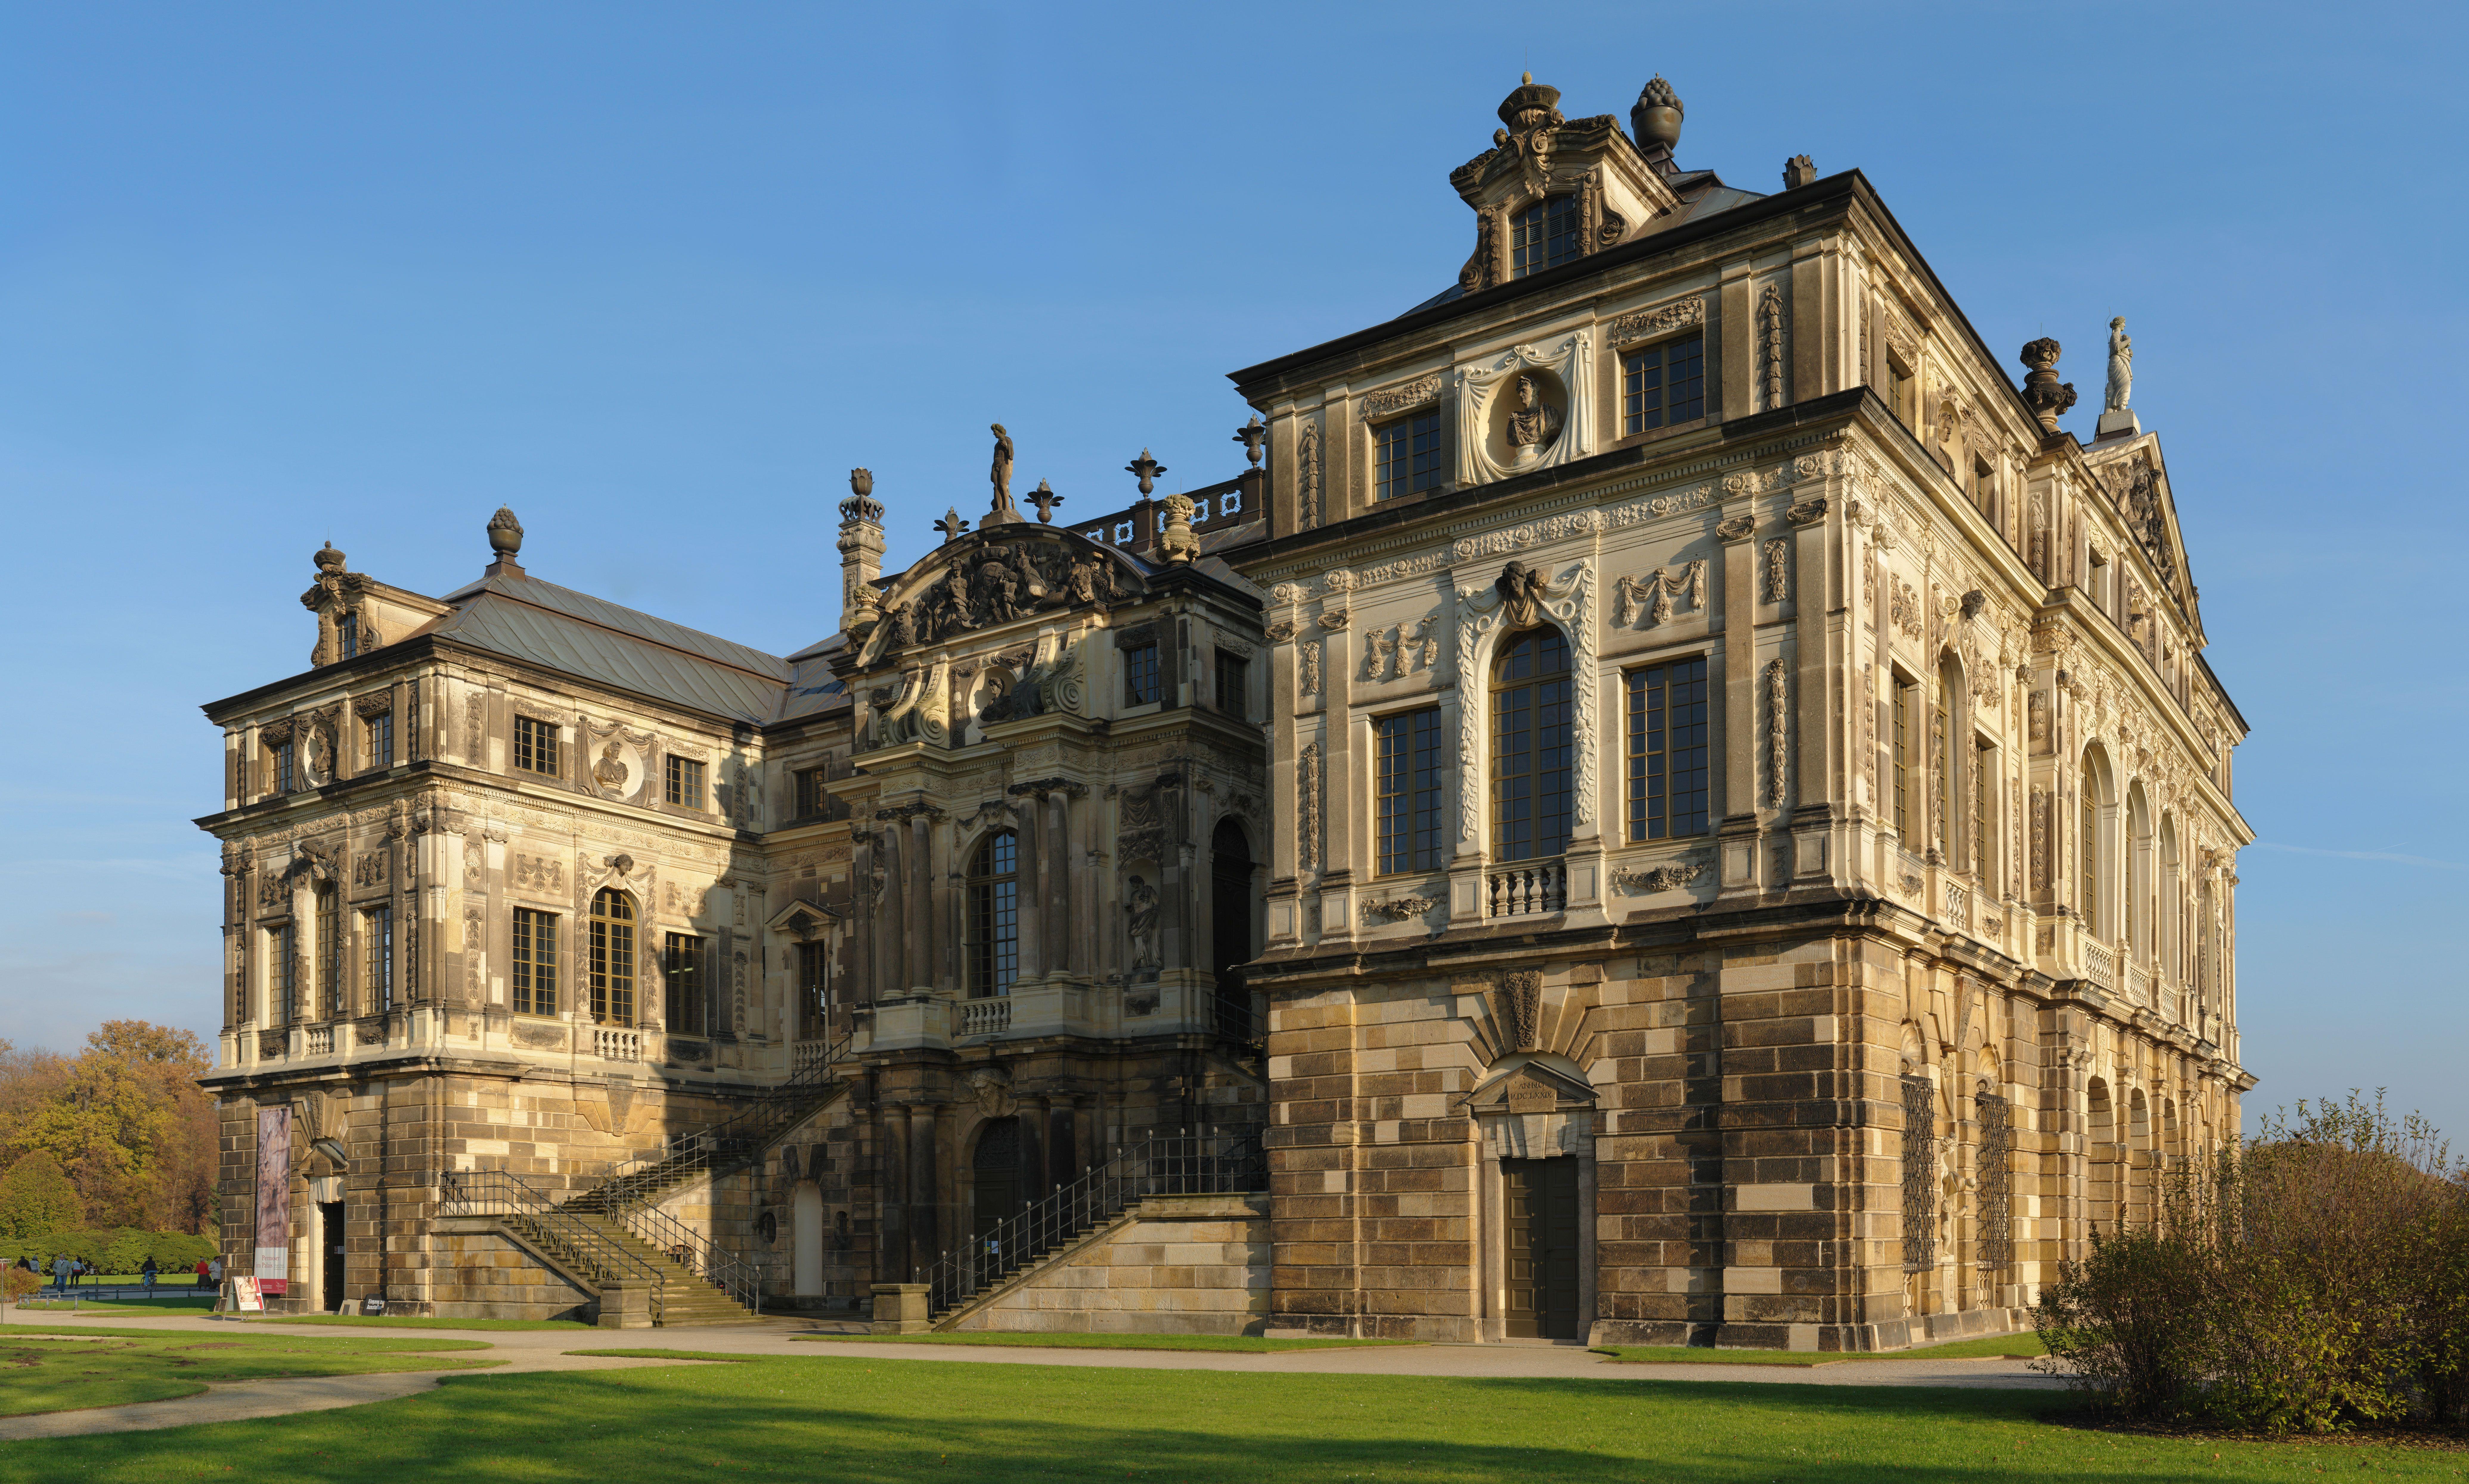 Dresden Palais Grosser Gart Jpg 8283 4980 German Architecture Mansions Castle